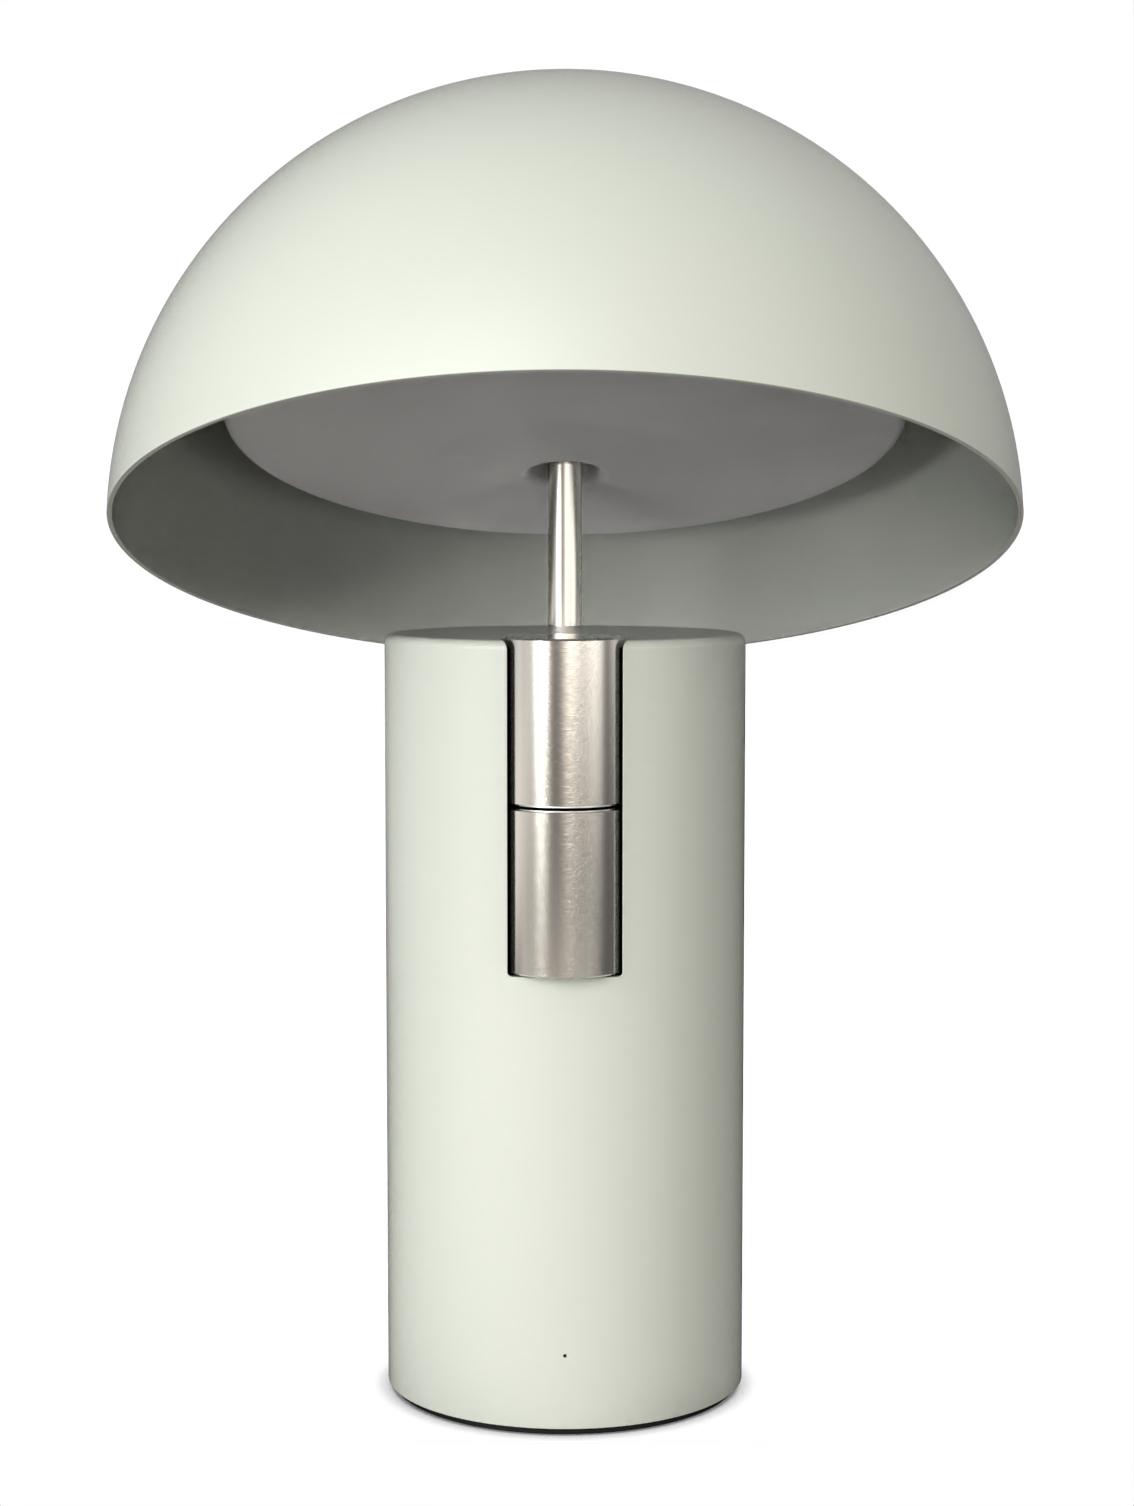 Alto Luminaire Acoustique Lampe Enceinte Jaune Fabrique Vert Nickel